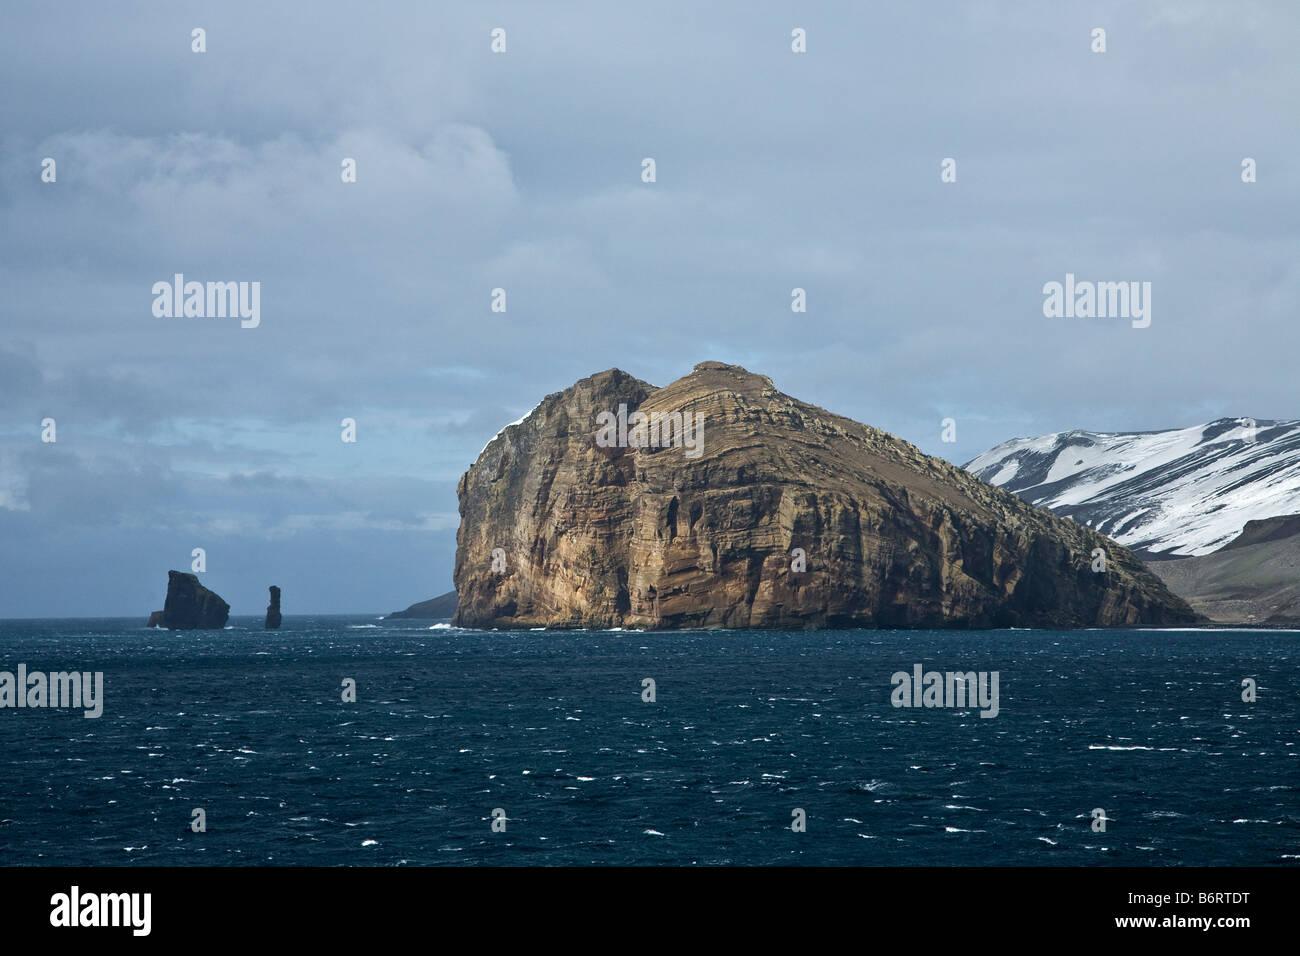 Rock Stacks near Deception Island South Shetland Islands Antarctica - Stock Image